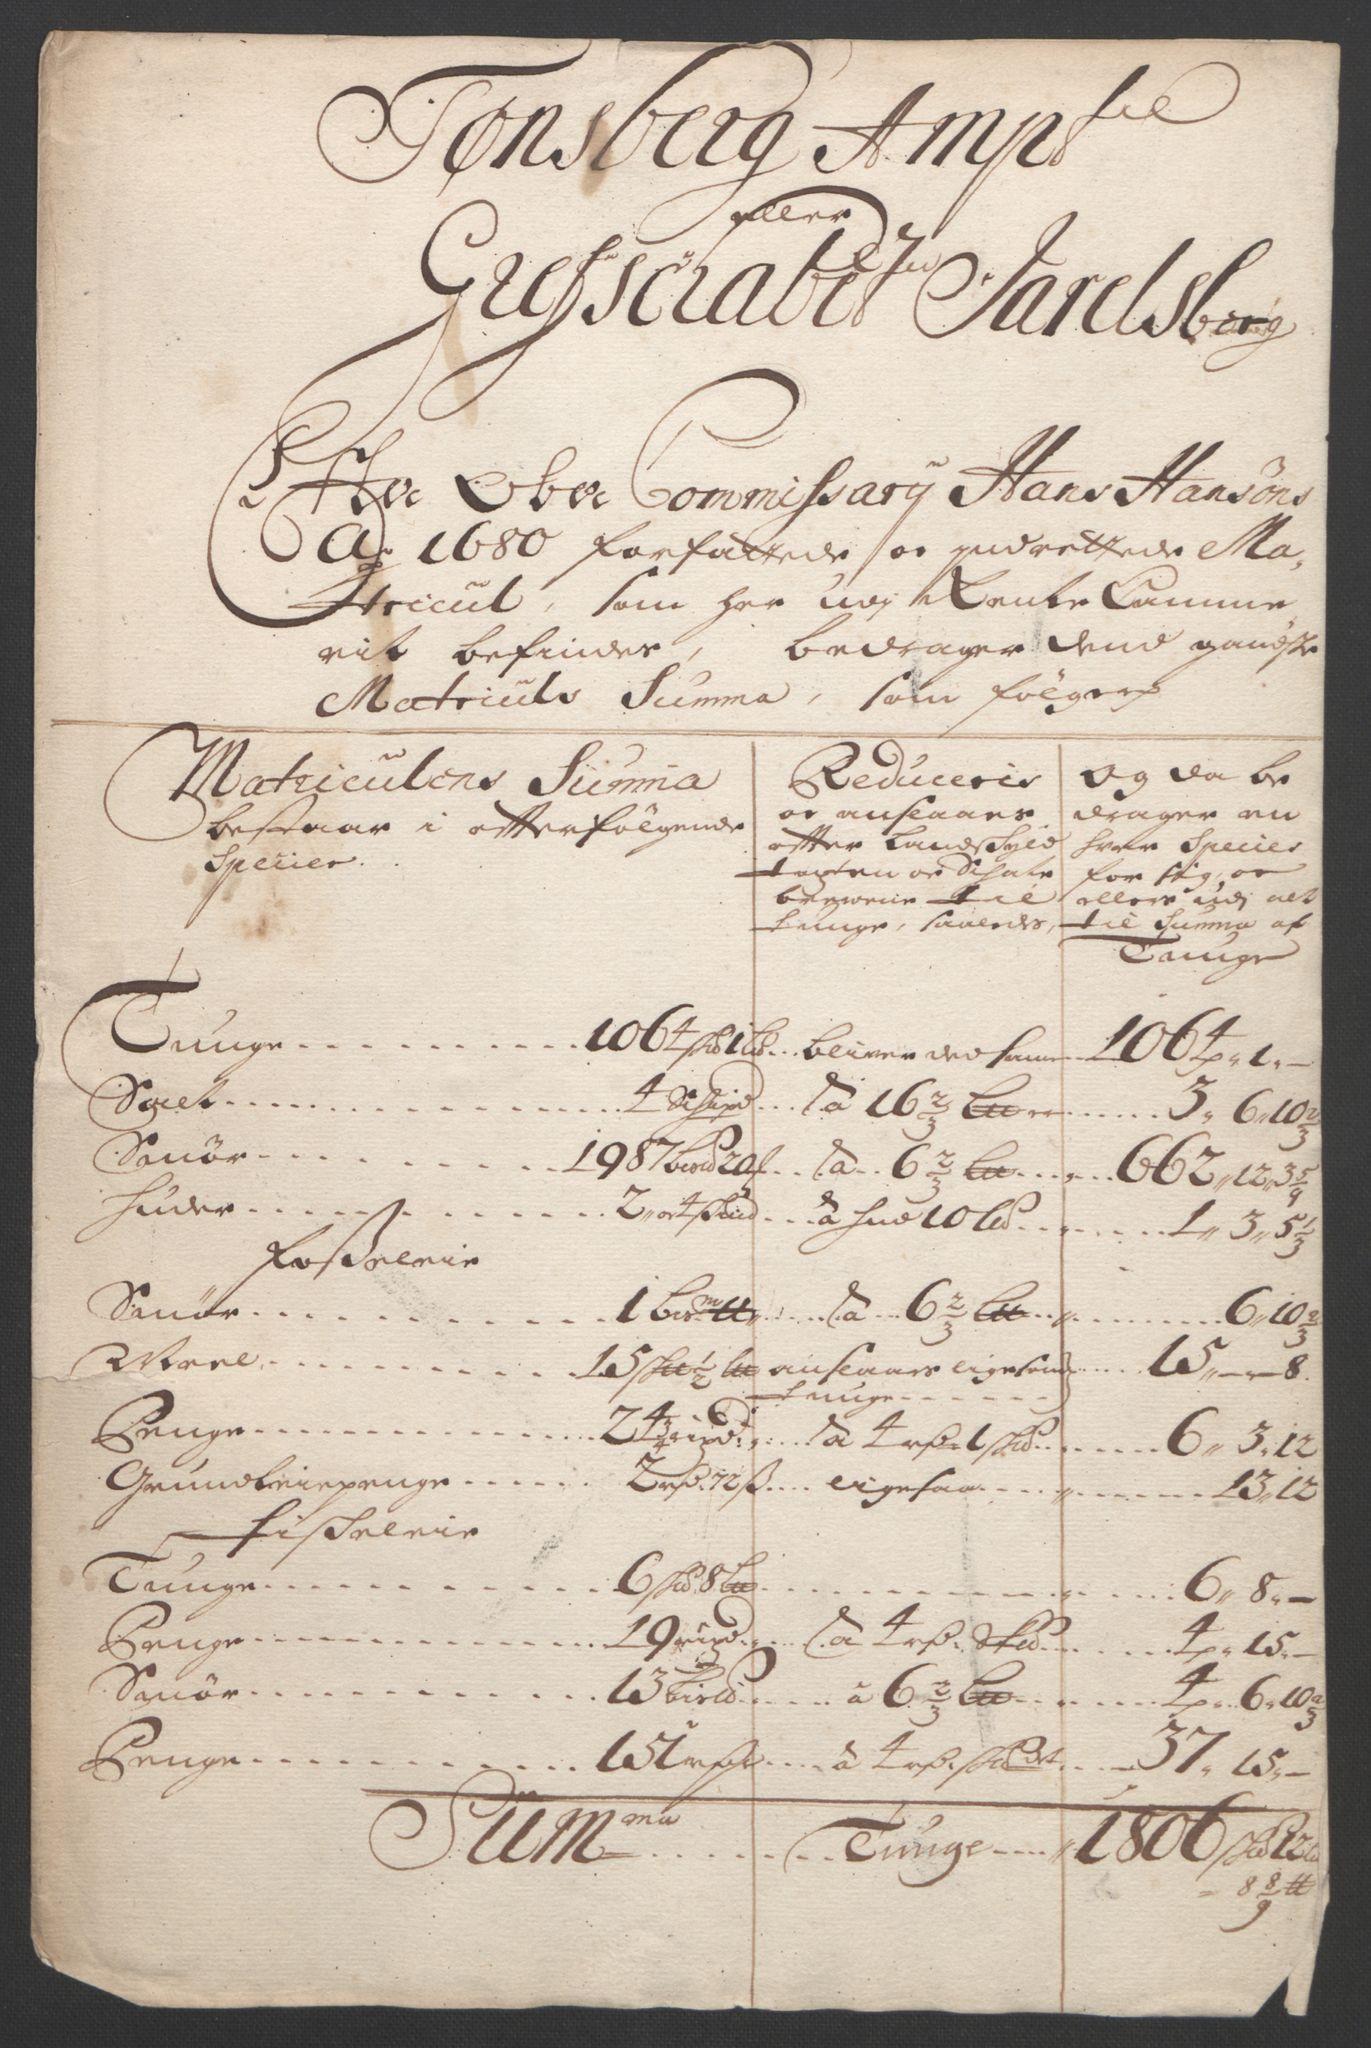 RA, Rentekammeret inntil 1814, Reviderte regnskaper, Fogderegnskap, R32/L1864: Fogderegnskap Jarlsberg grevskap, 1691, s. 19